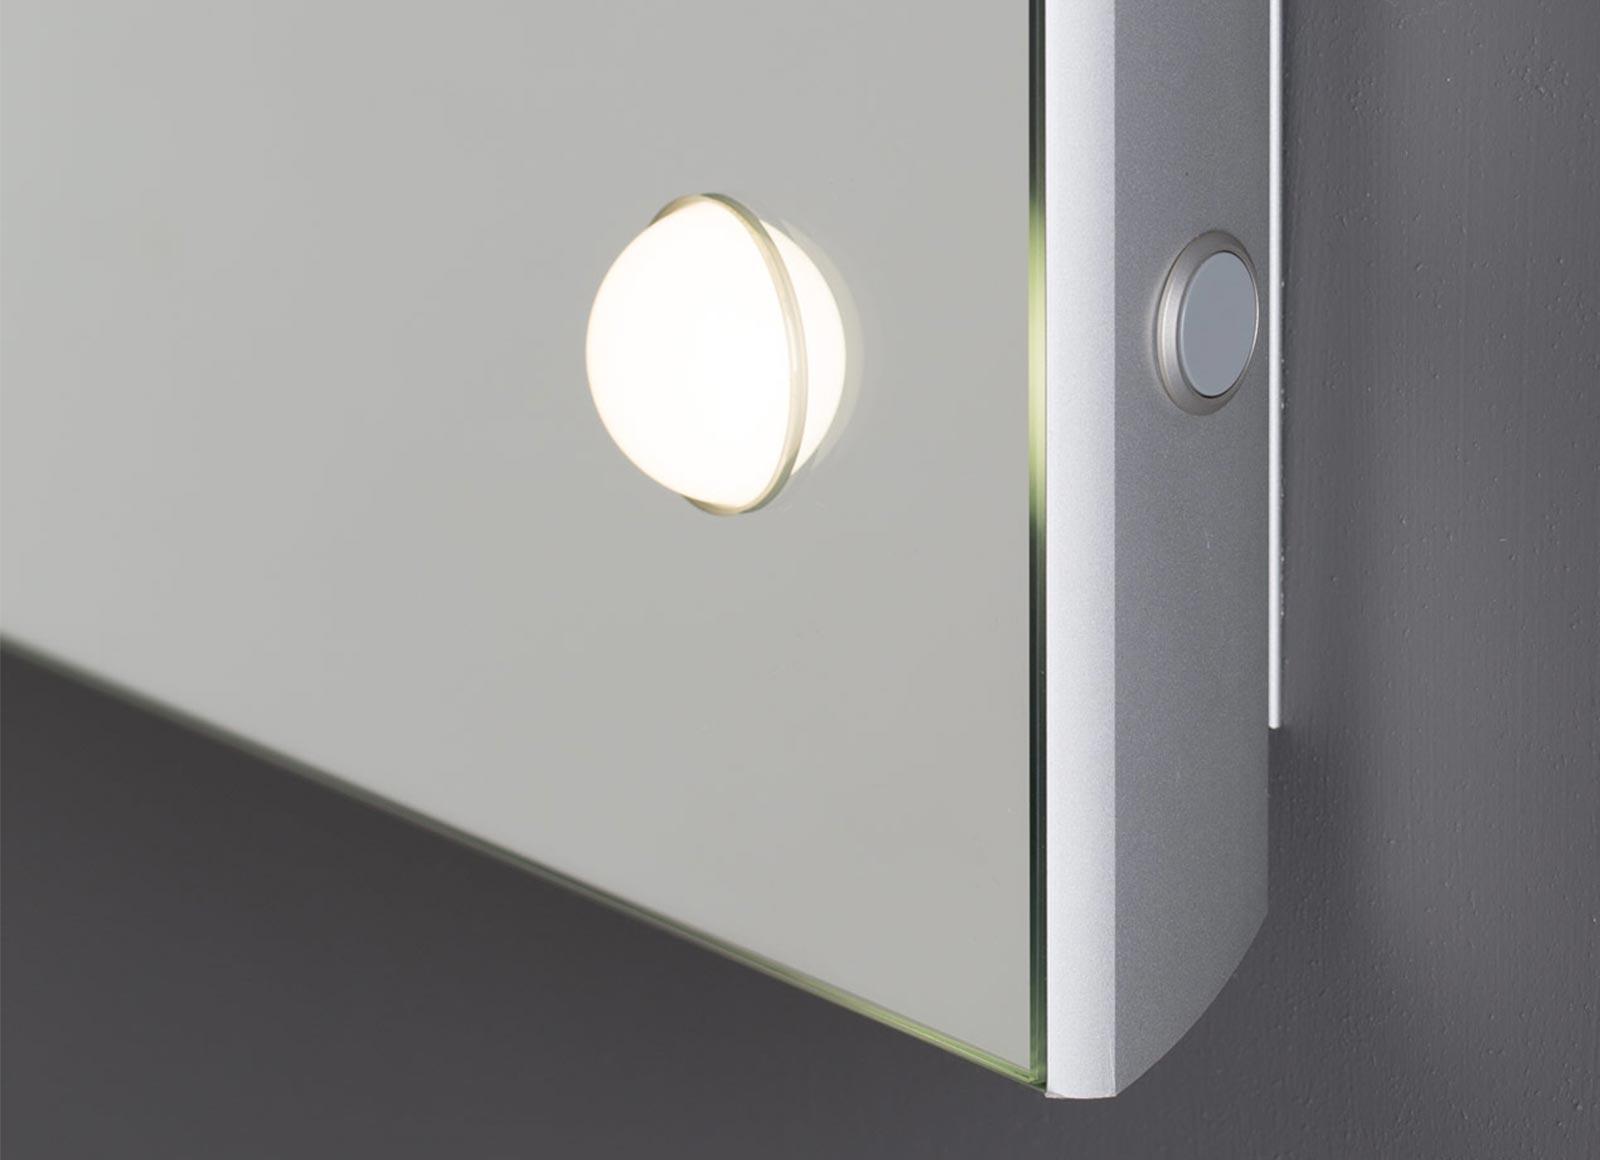 Specchi Luce Unica iLight